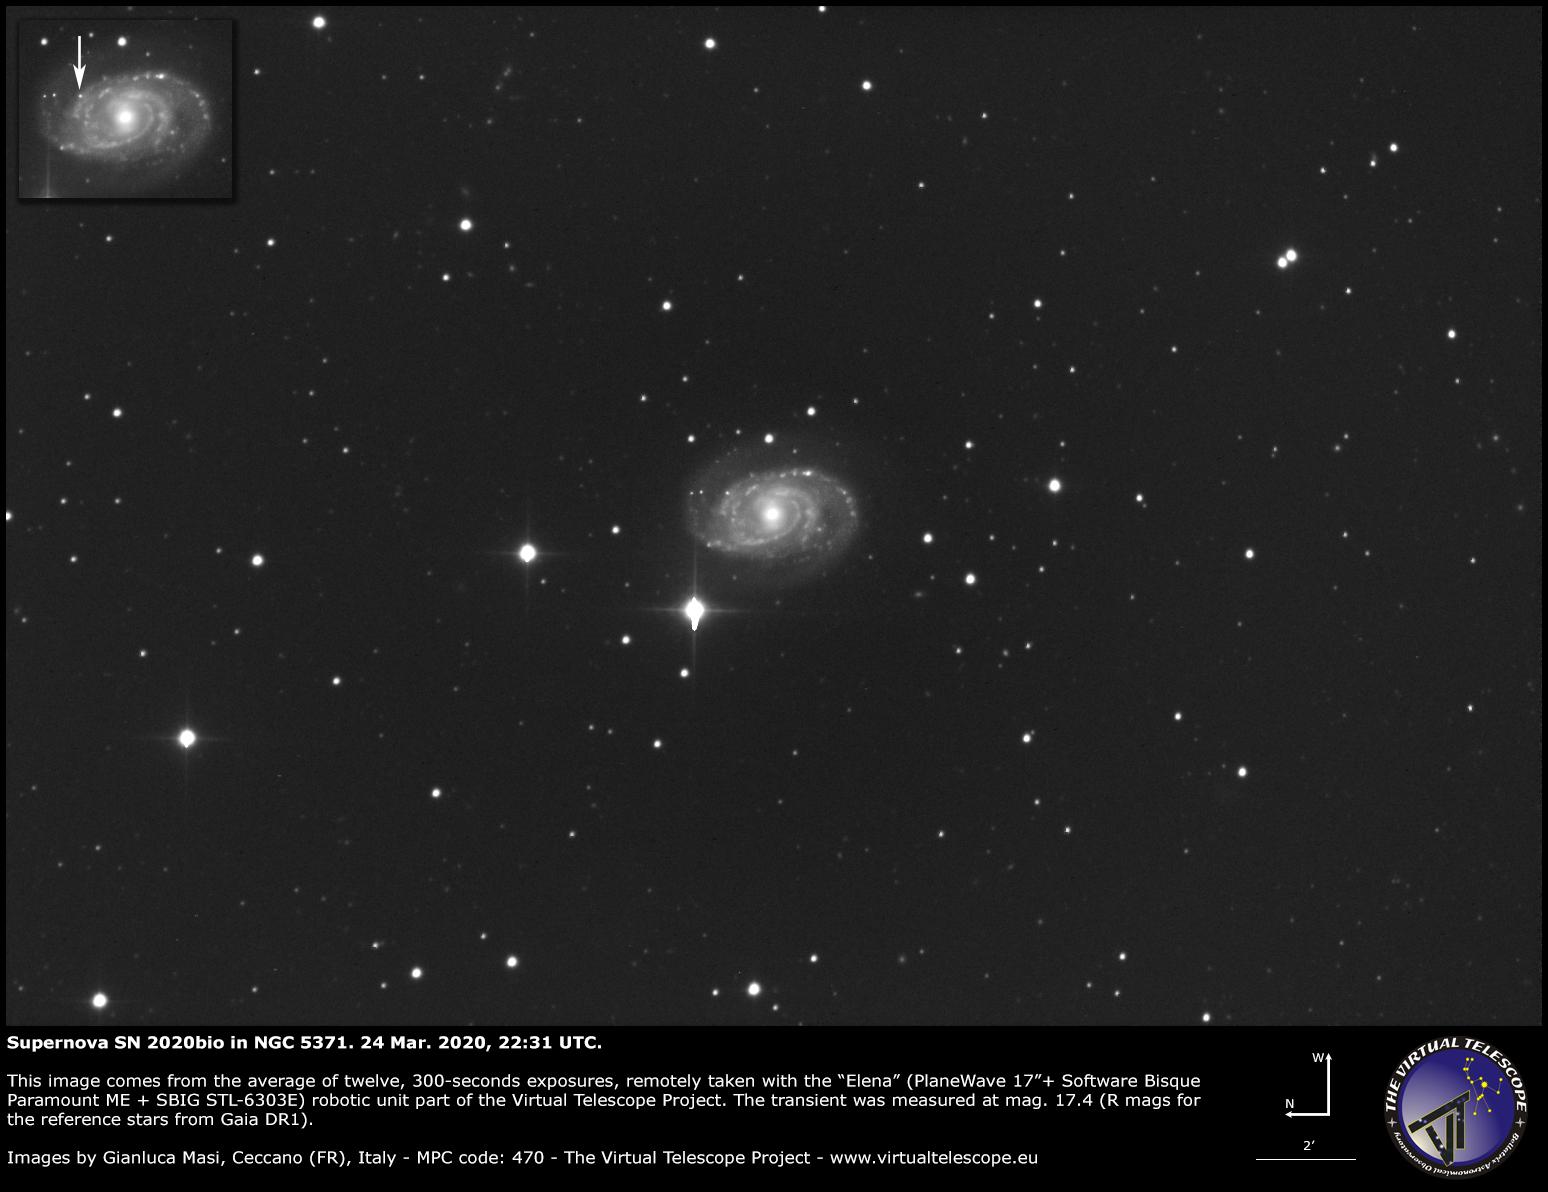 Supernova SN 2020bio in NGC 5371. 24 Mar. 2020